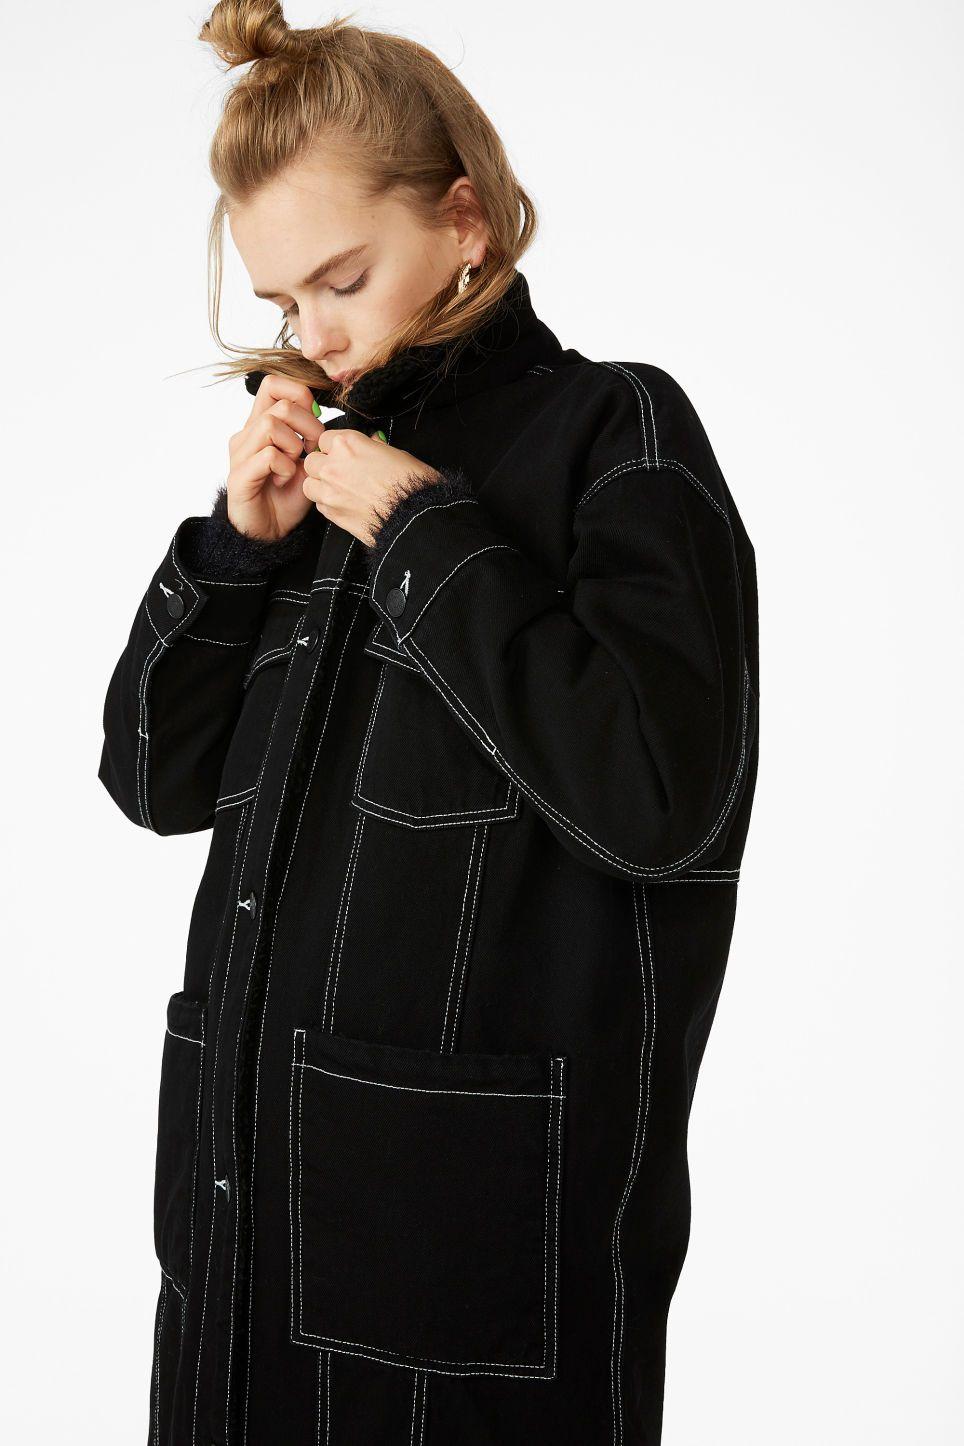 b3604b7af187 Monki contrast stitch denim jacket in black - A long padded denim jacket  with contrast stitching